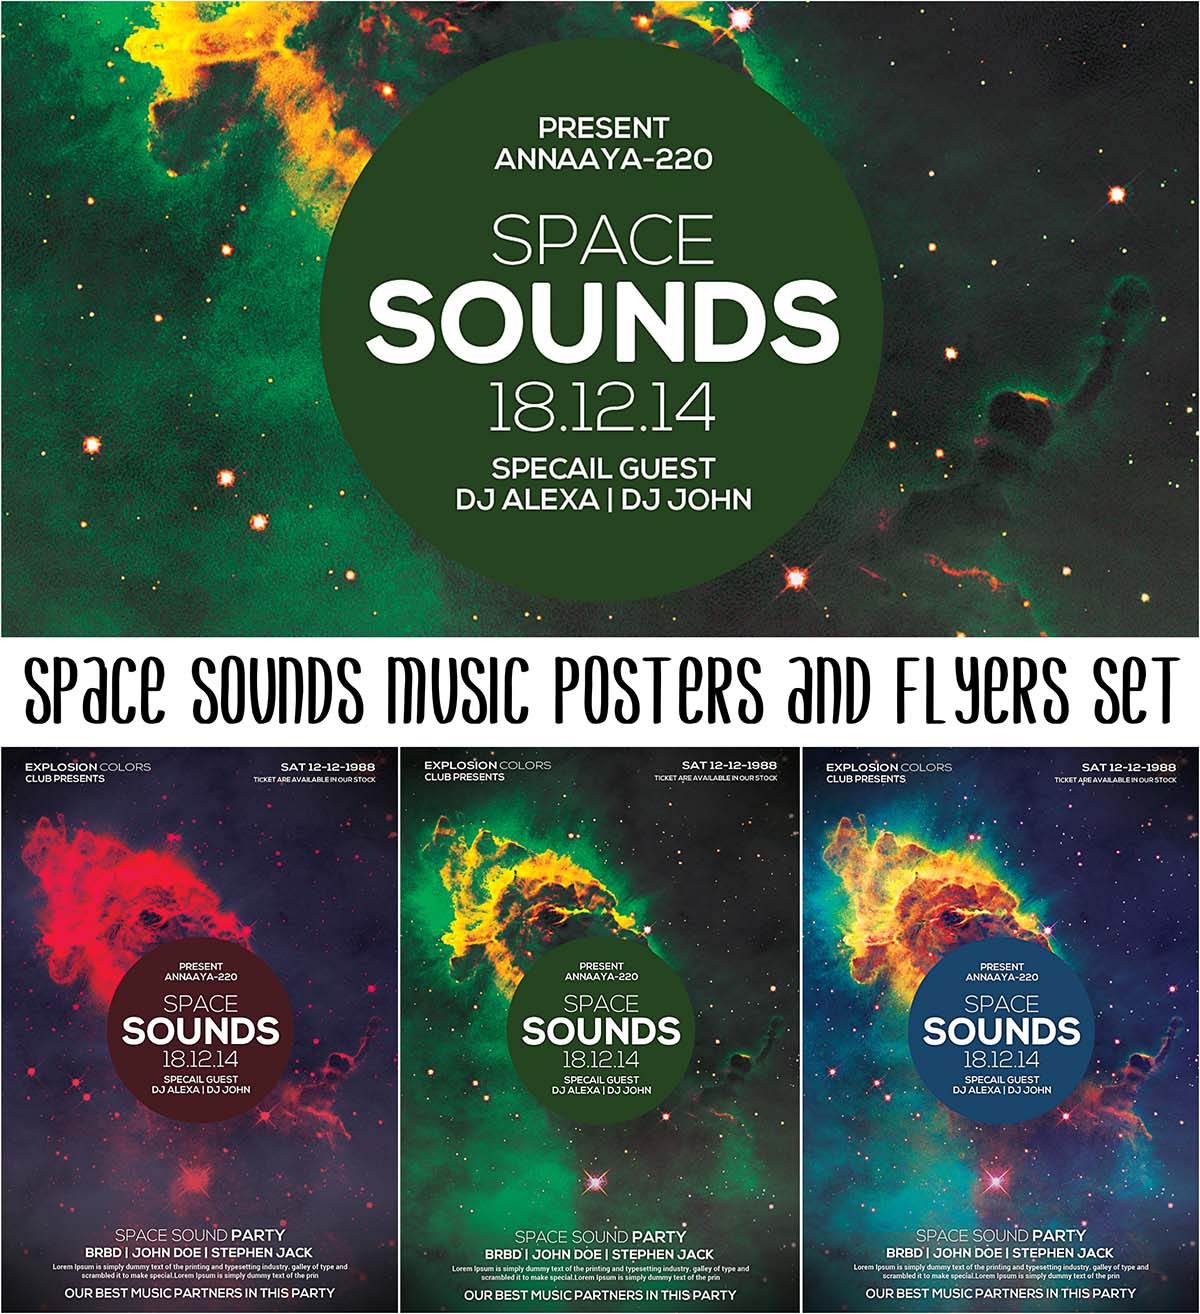 Space sounds music flyer set